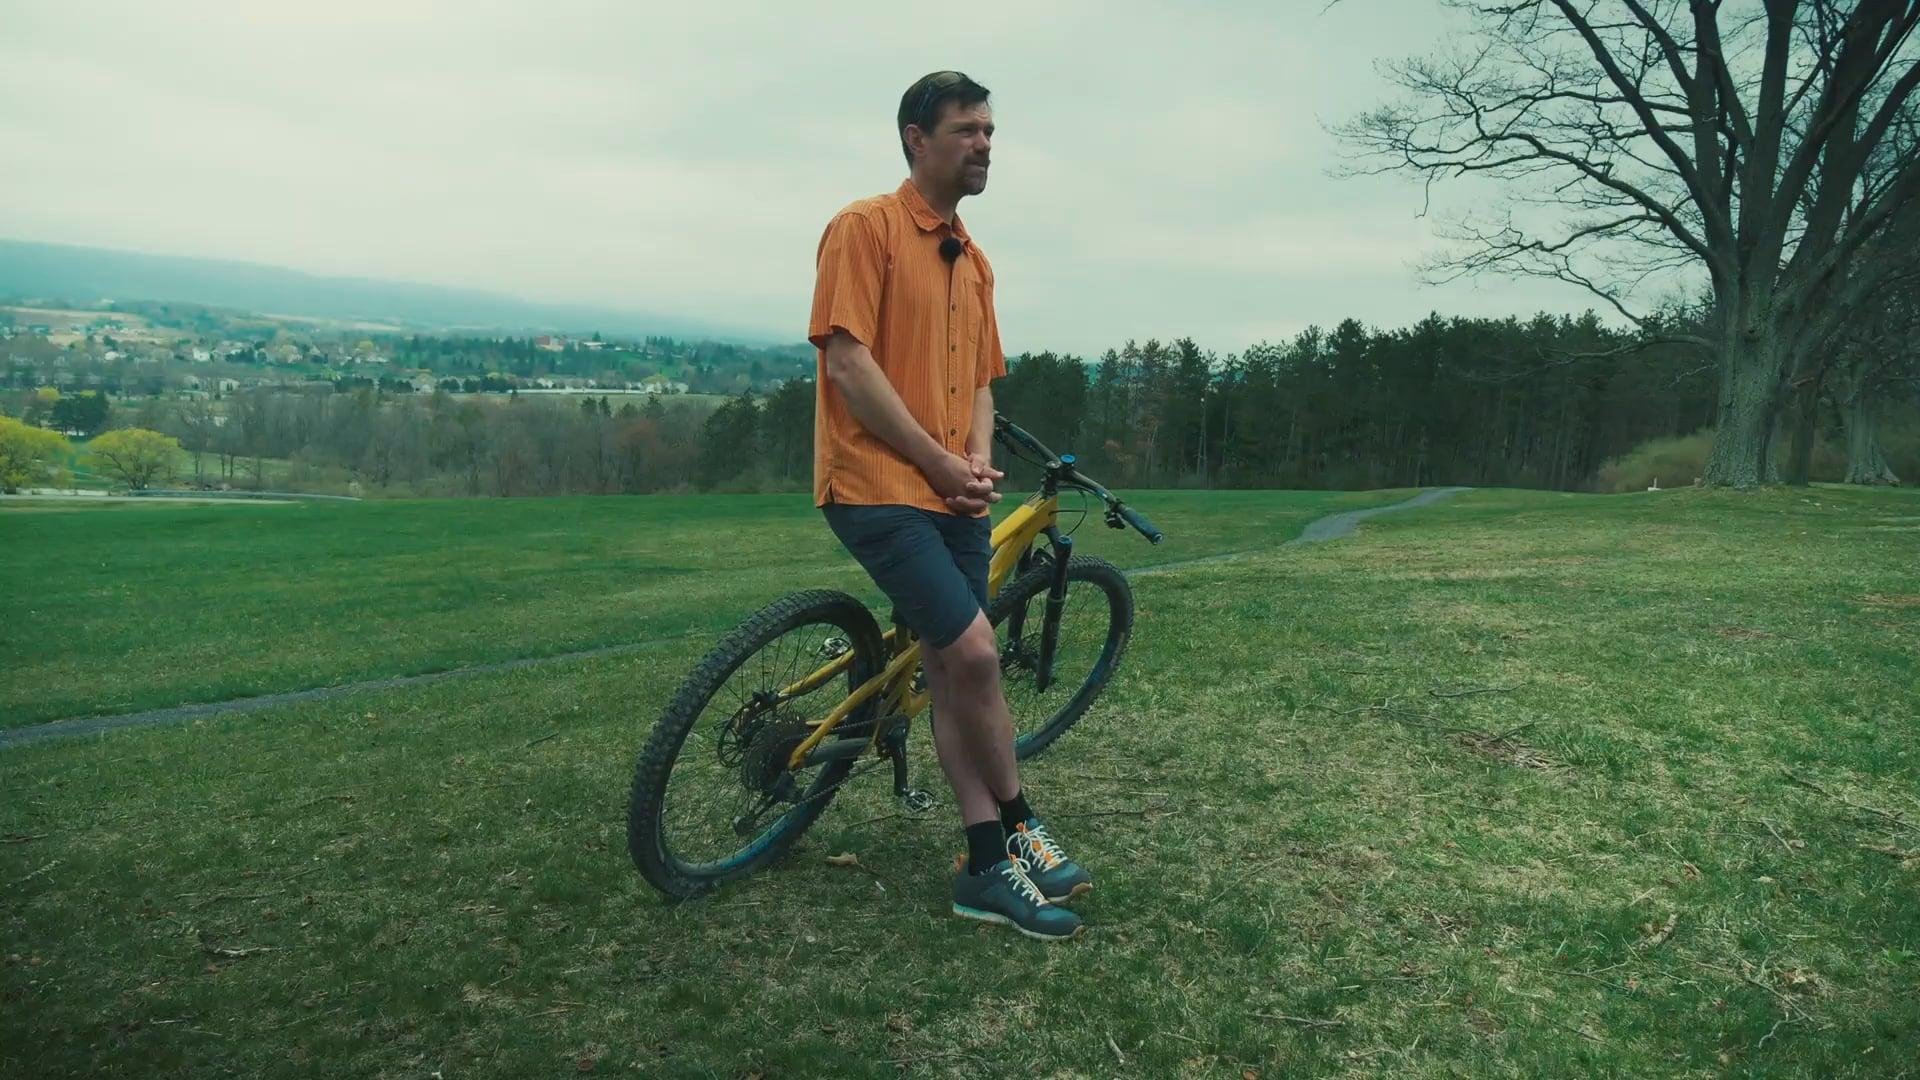 Nittany Mountain Biking Association